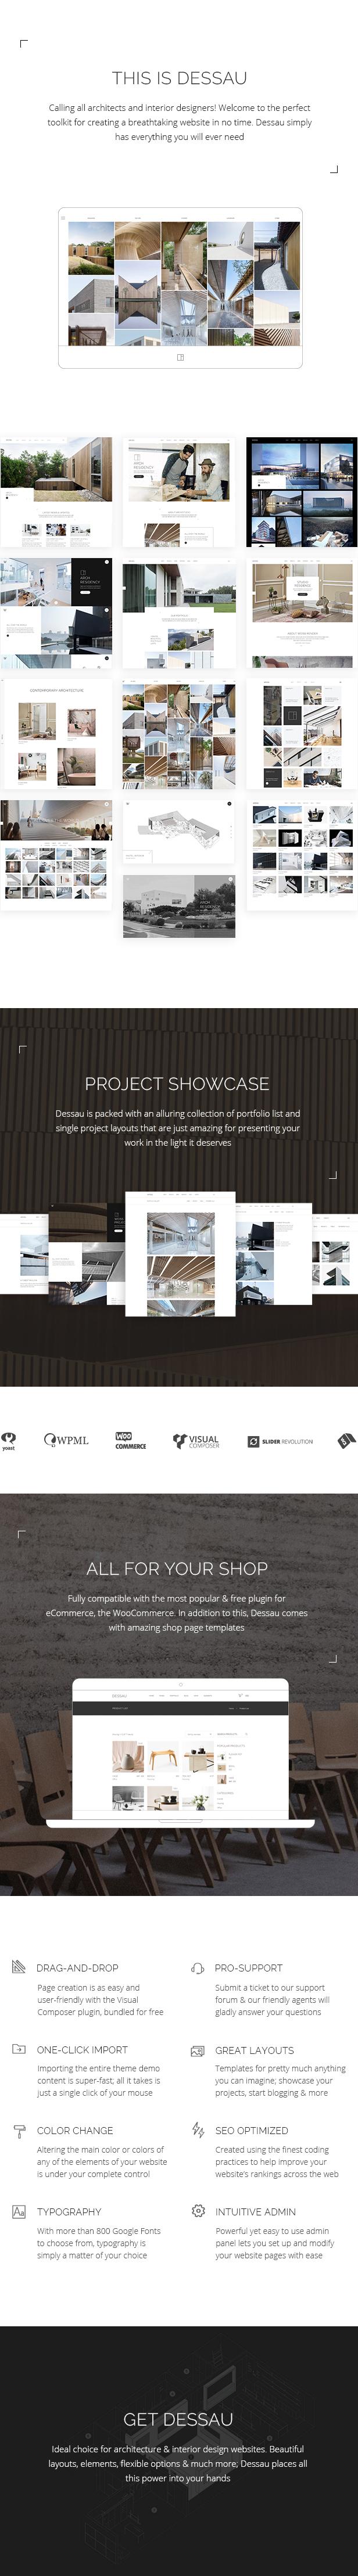 WordPress theme Dessau - A Contemporary Theme for Architects and Interior Designers (Portfolio)